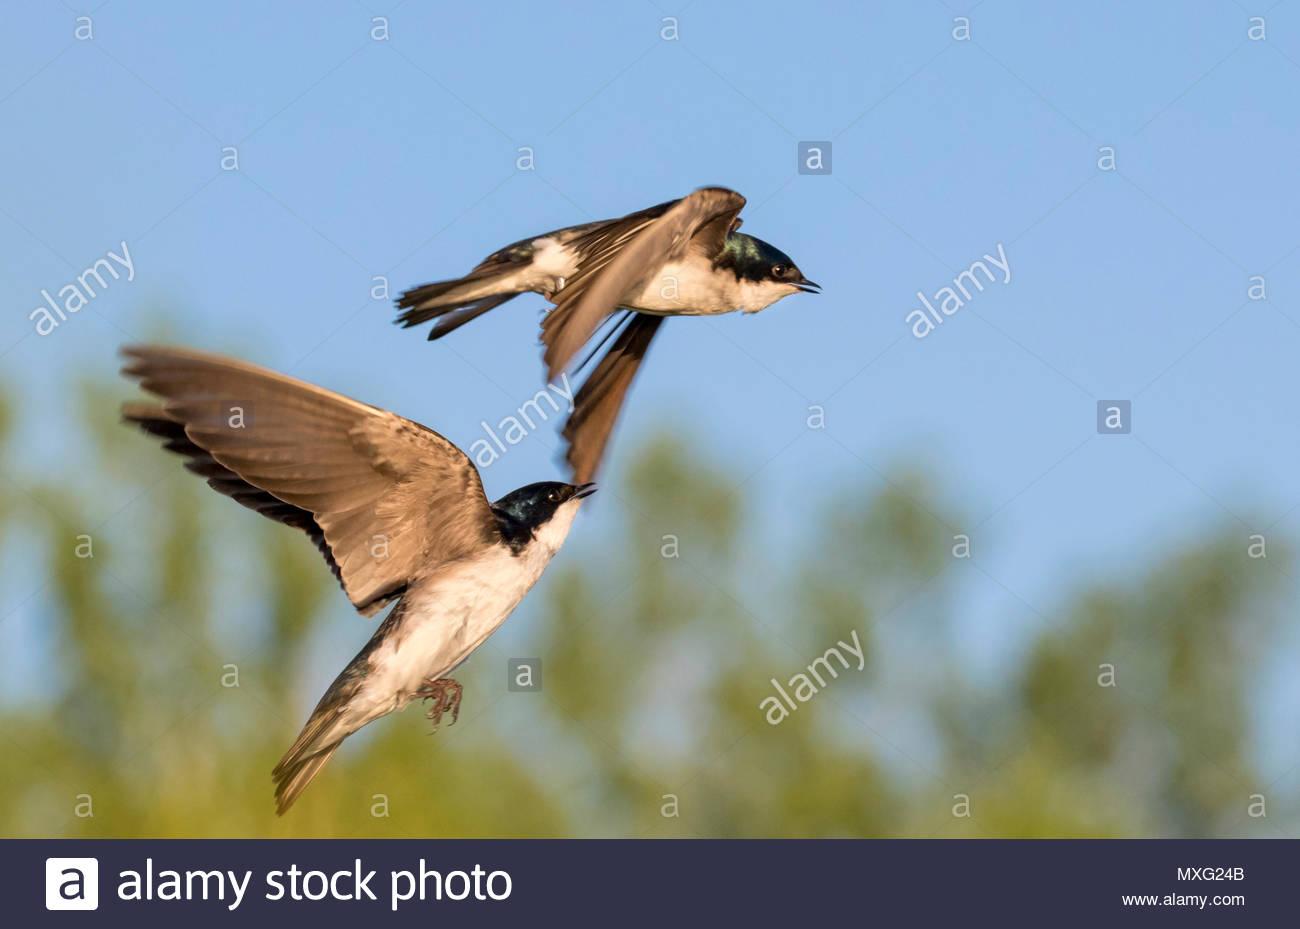 Tree swallows (Tachycineta bicolor) chasing in the air, Iowa, USA - Stock Image